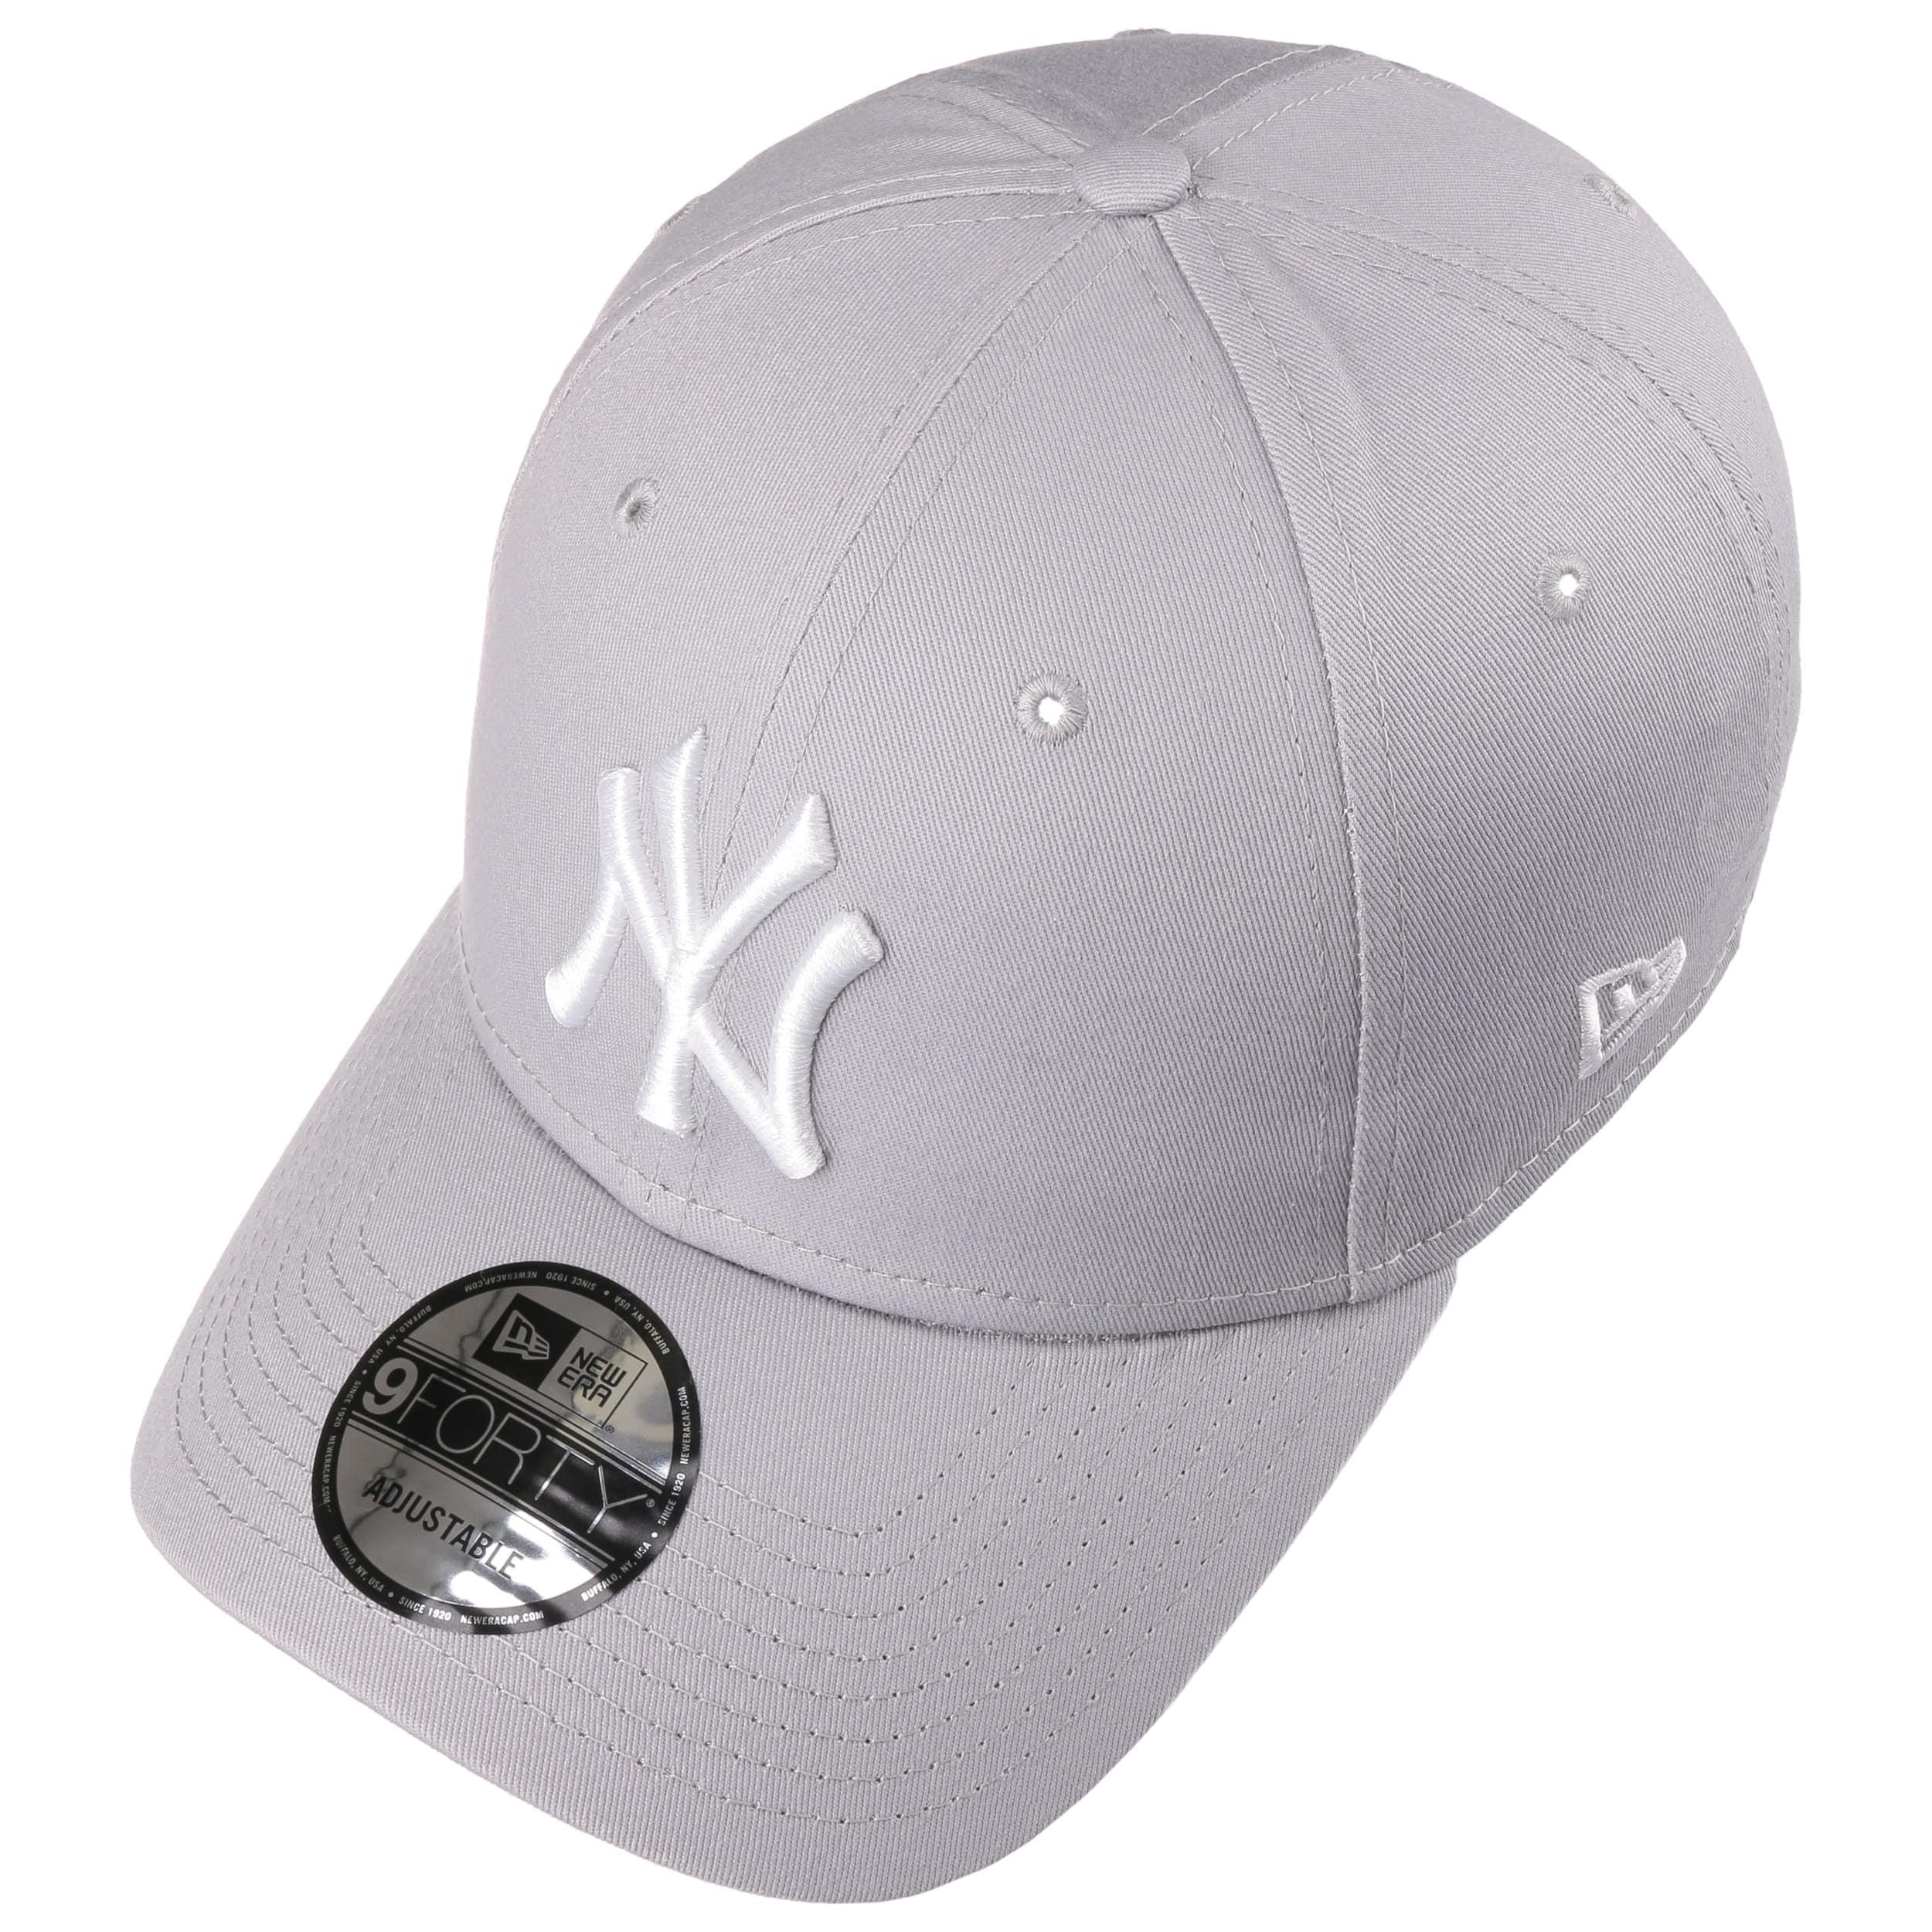 79645fec26ed ... 9Forty League Basic Yankees Cap by New Era - light grey 1 ...